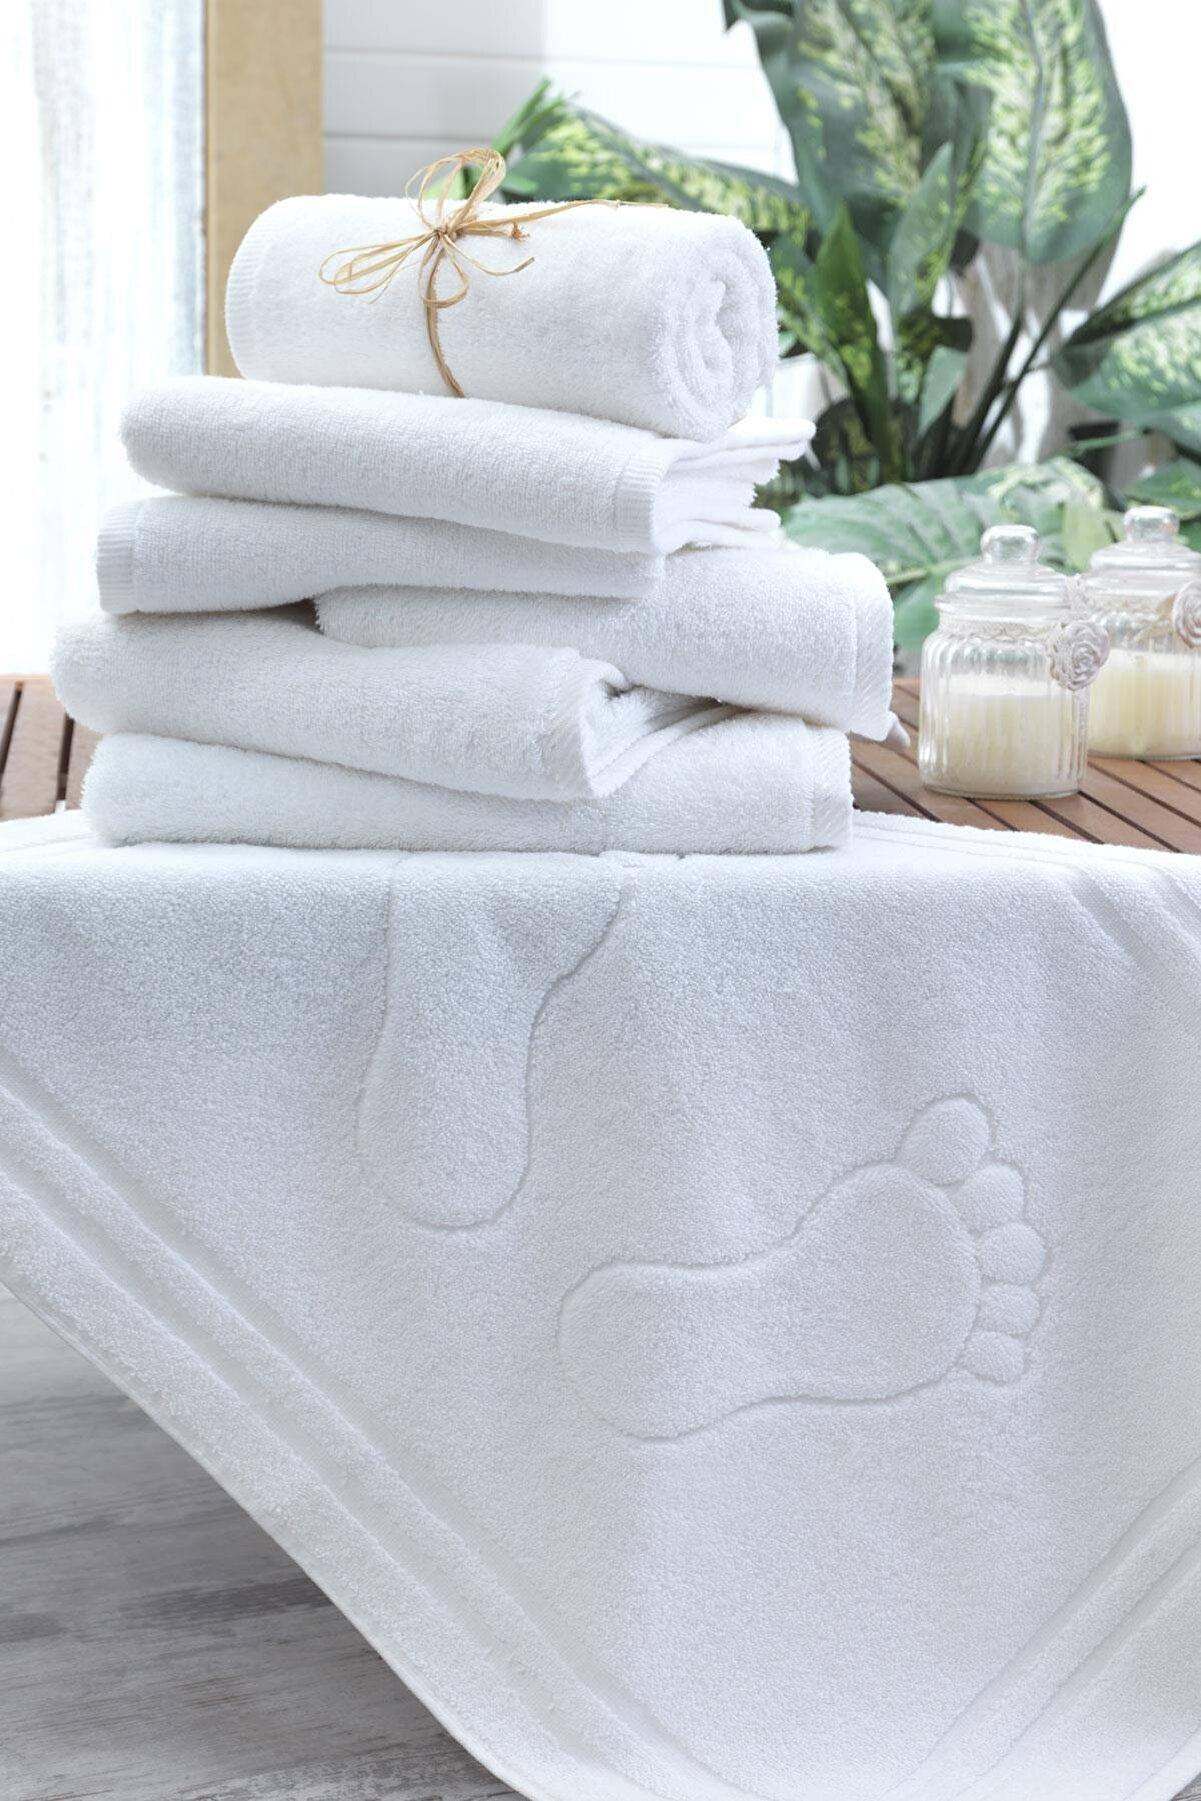 Lux Home Banyo Ayak Havlusu Paspası